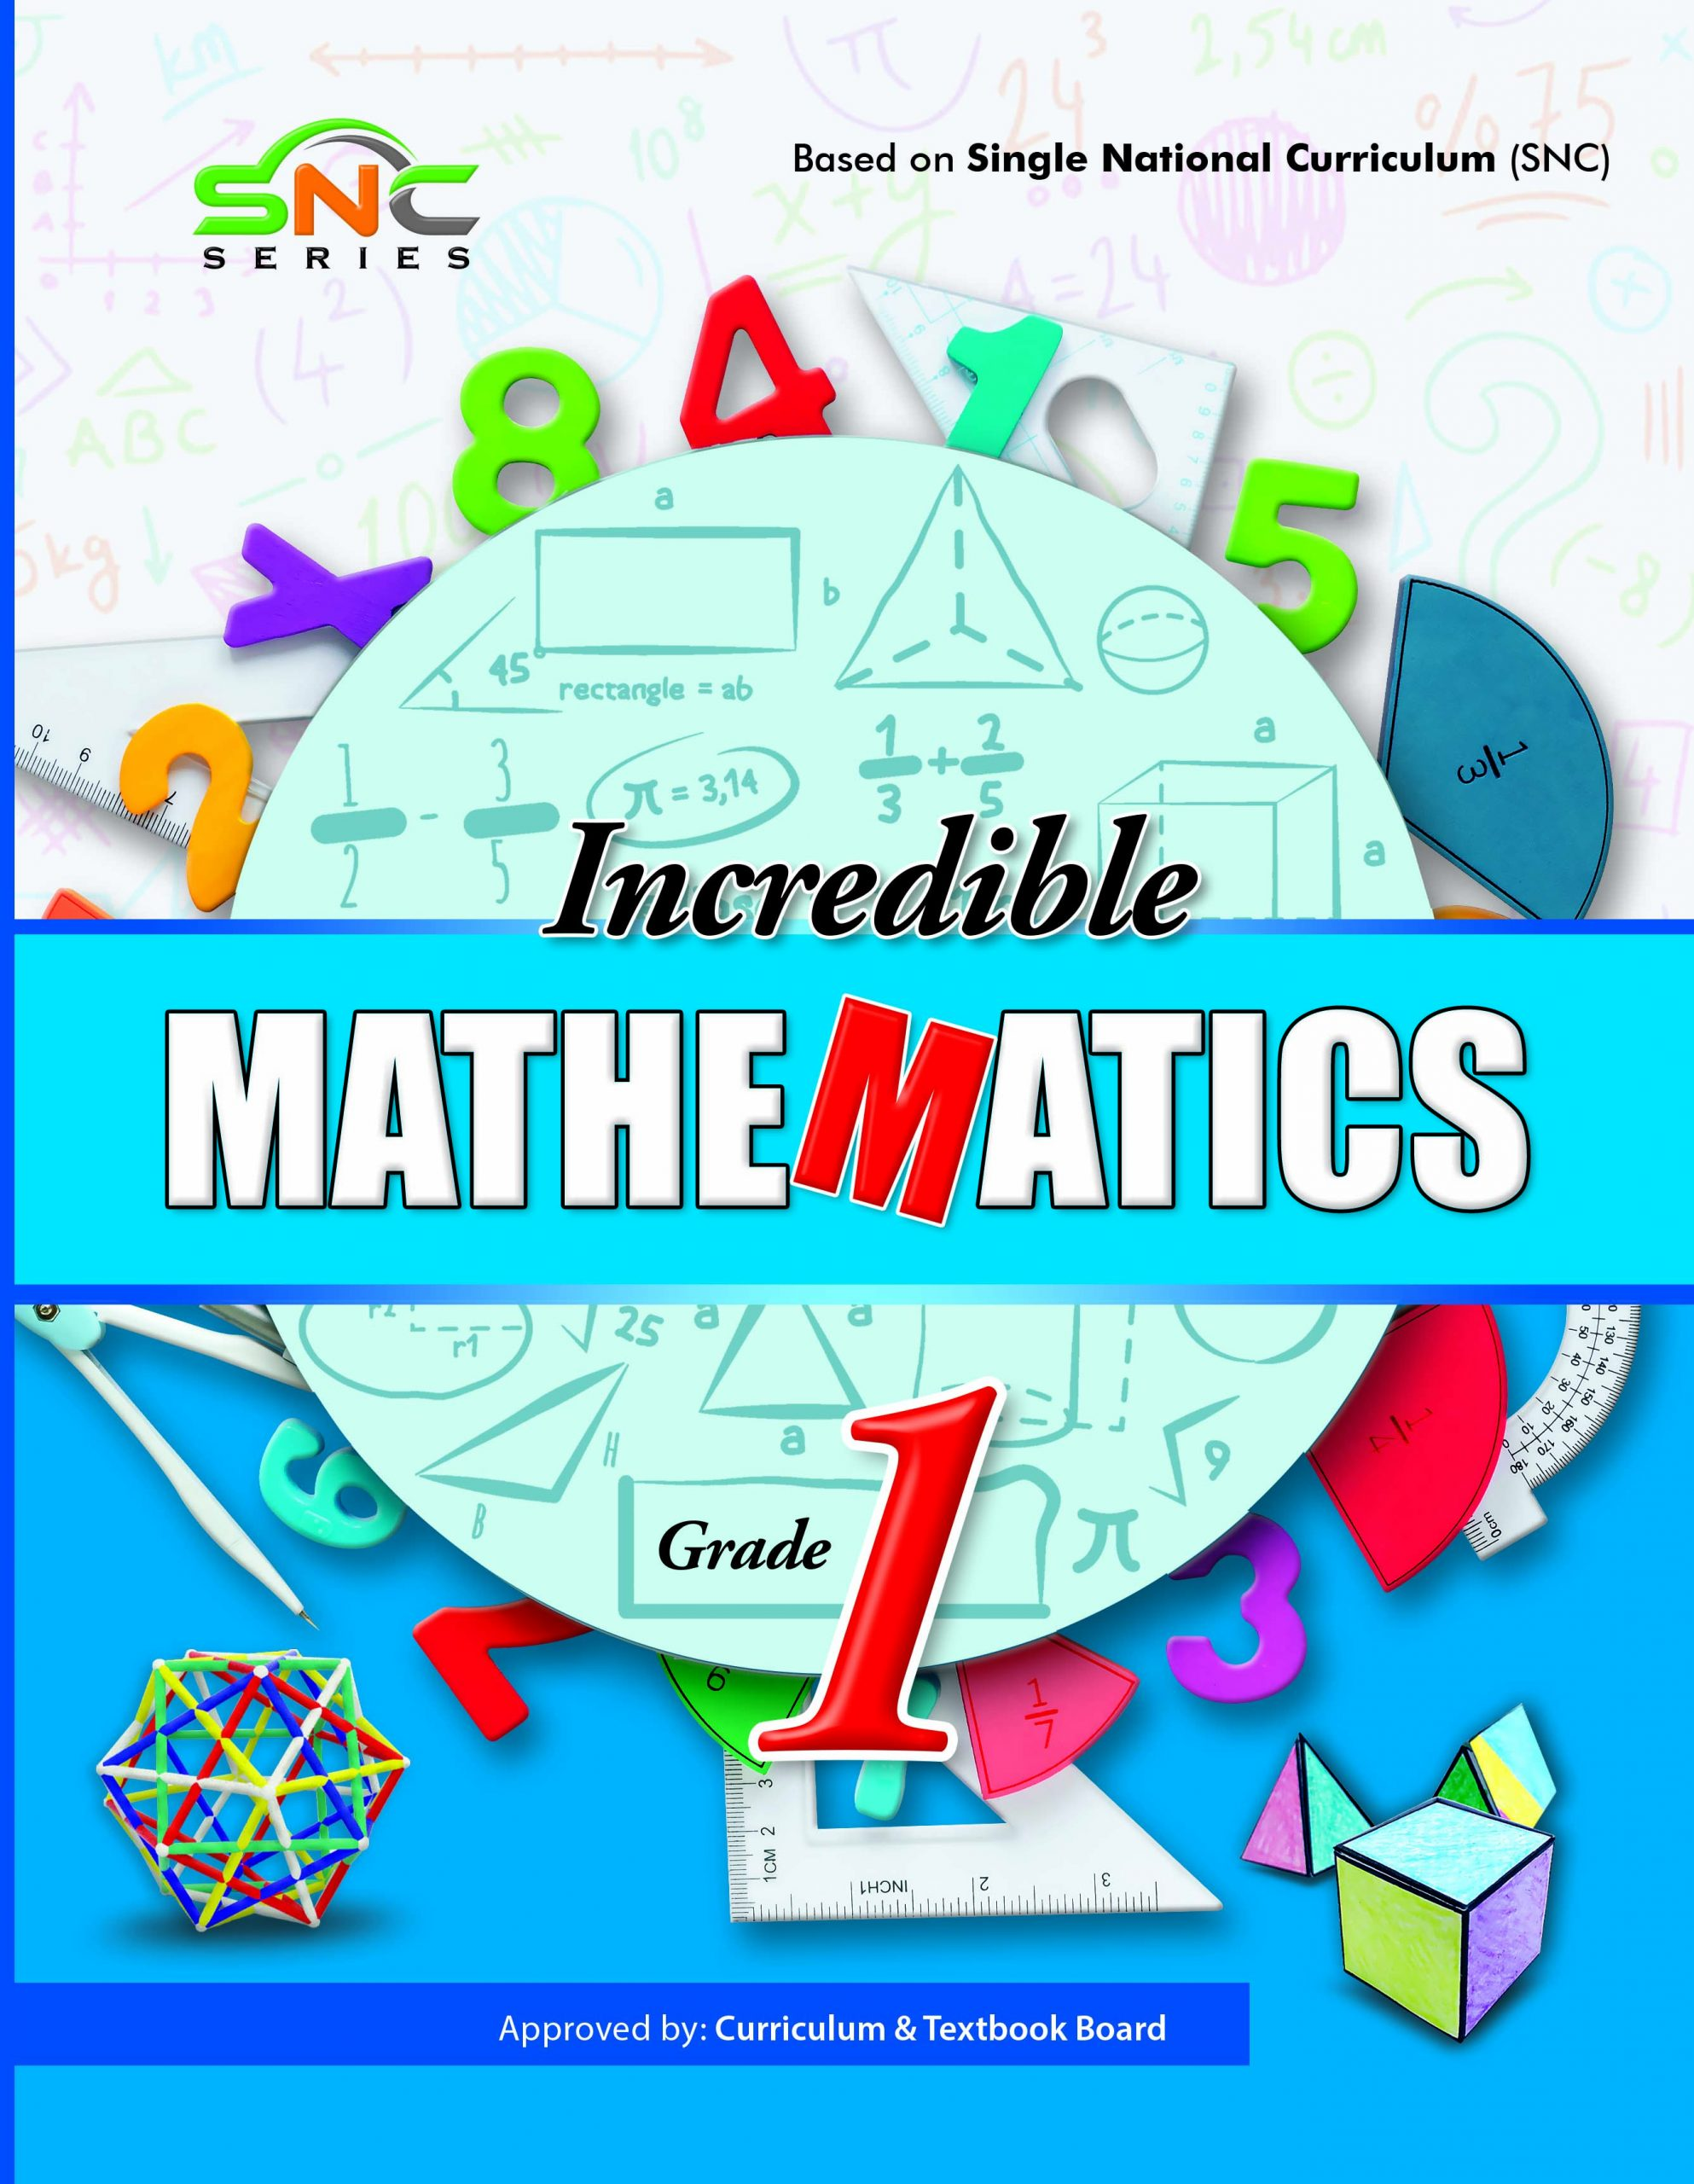 Mathemtatics 01 Title ( SNC Series )